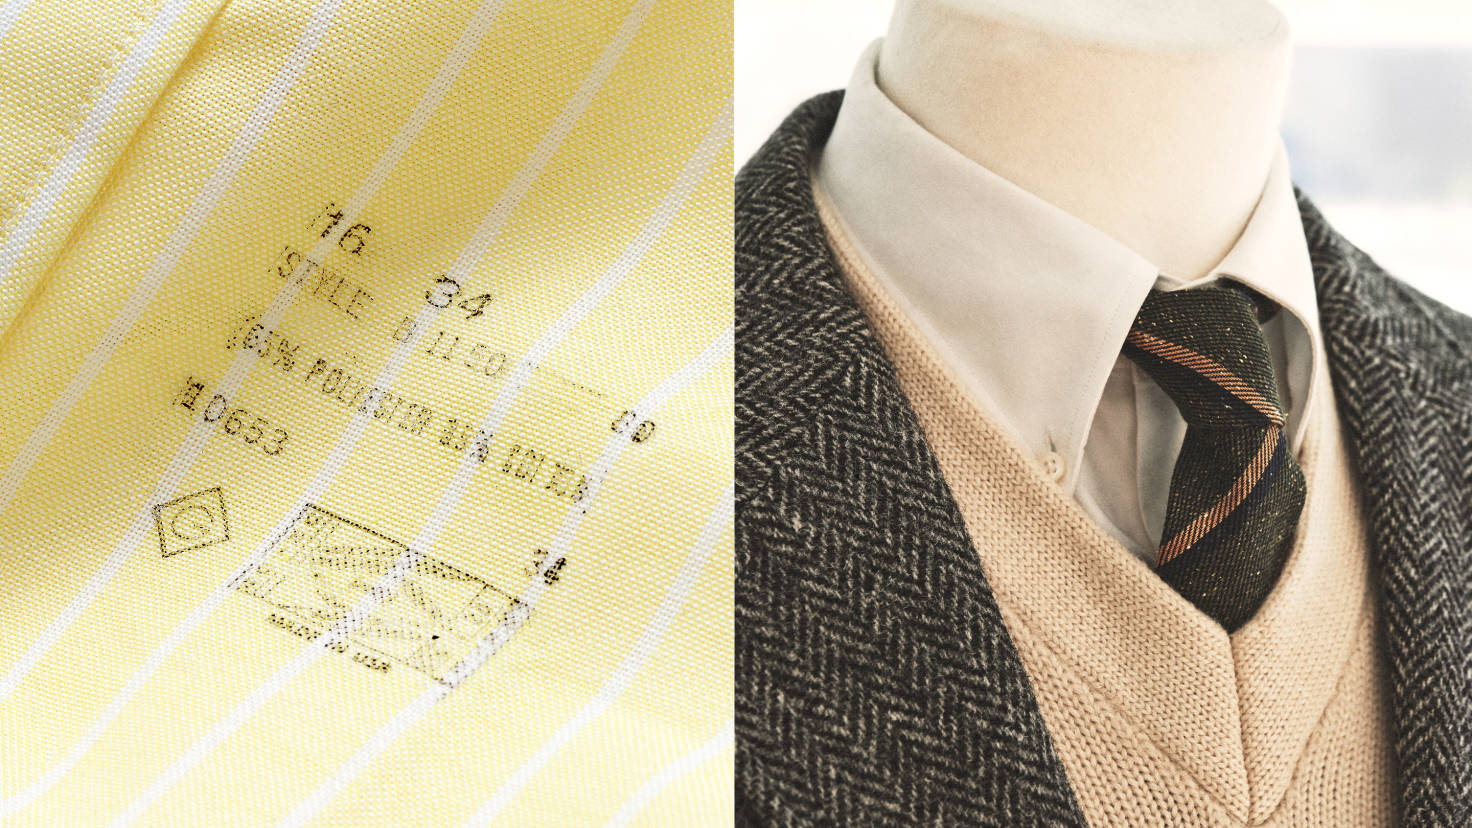 Слева классический винтажный снимок логотипа бренда на рубашке, справа воротник рубашки GANT крупным планом.